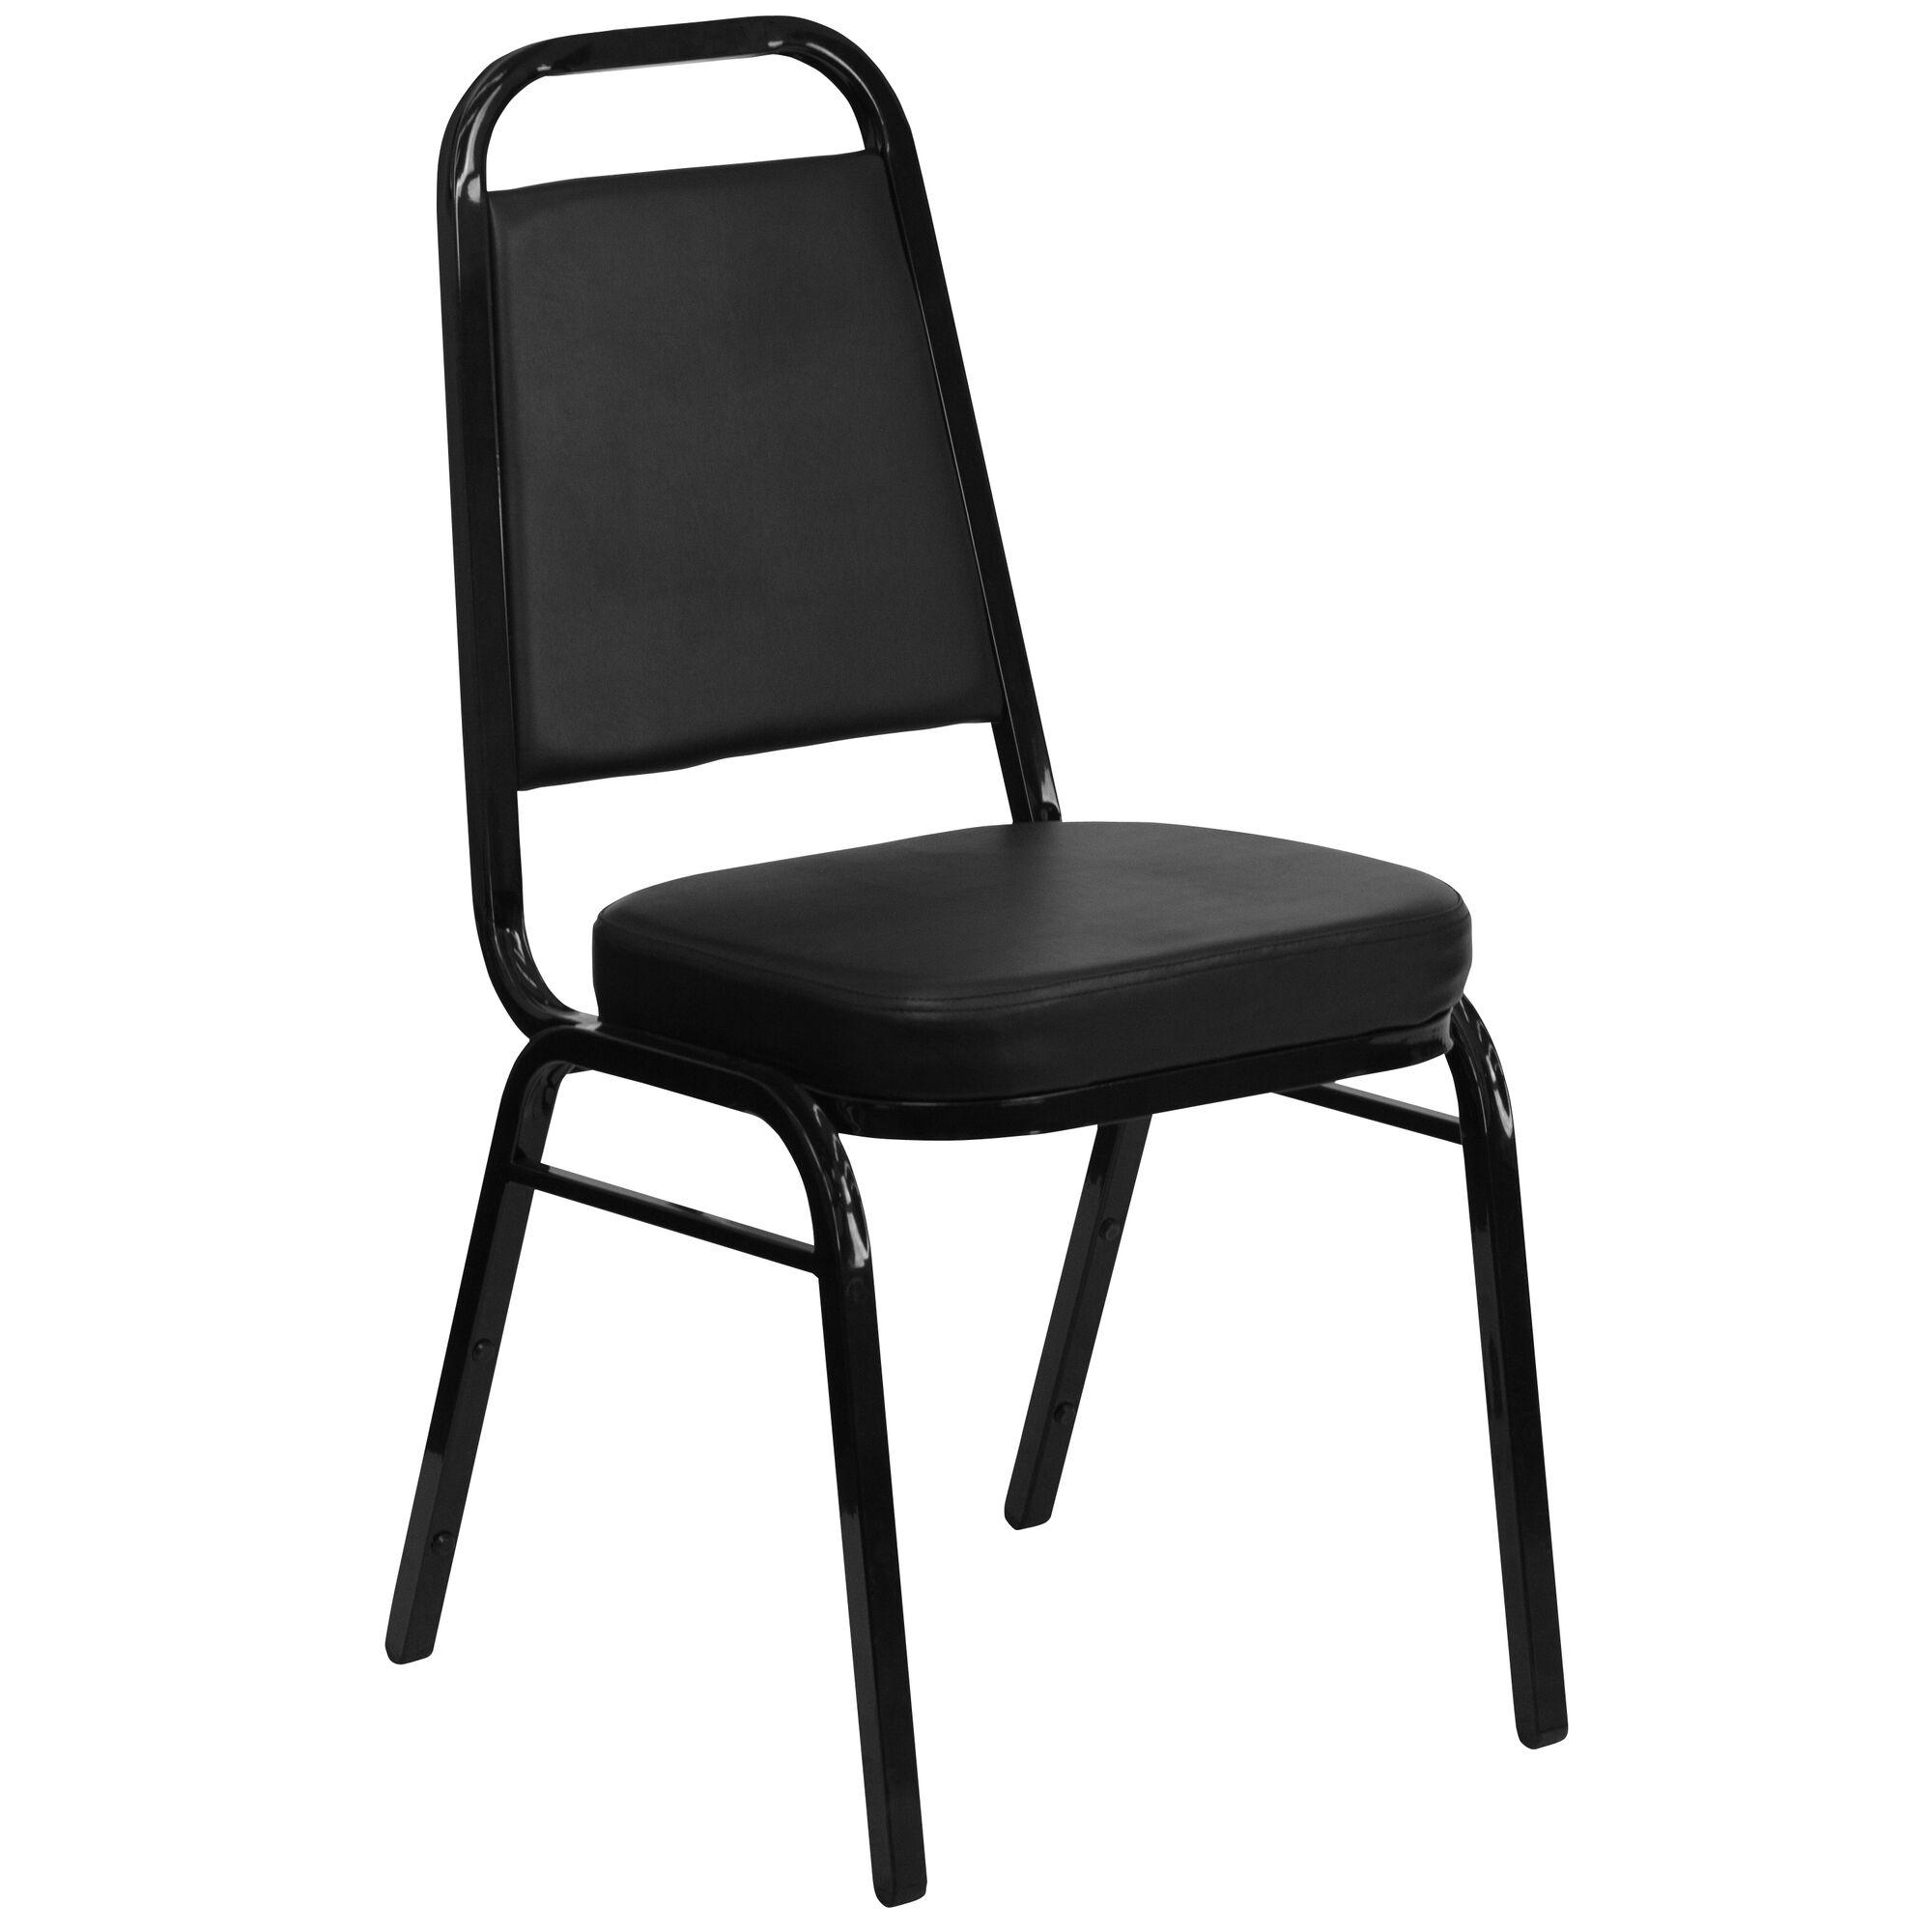 stack chairs bizchair com